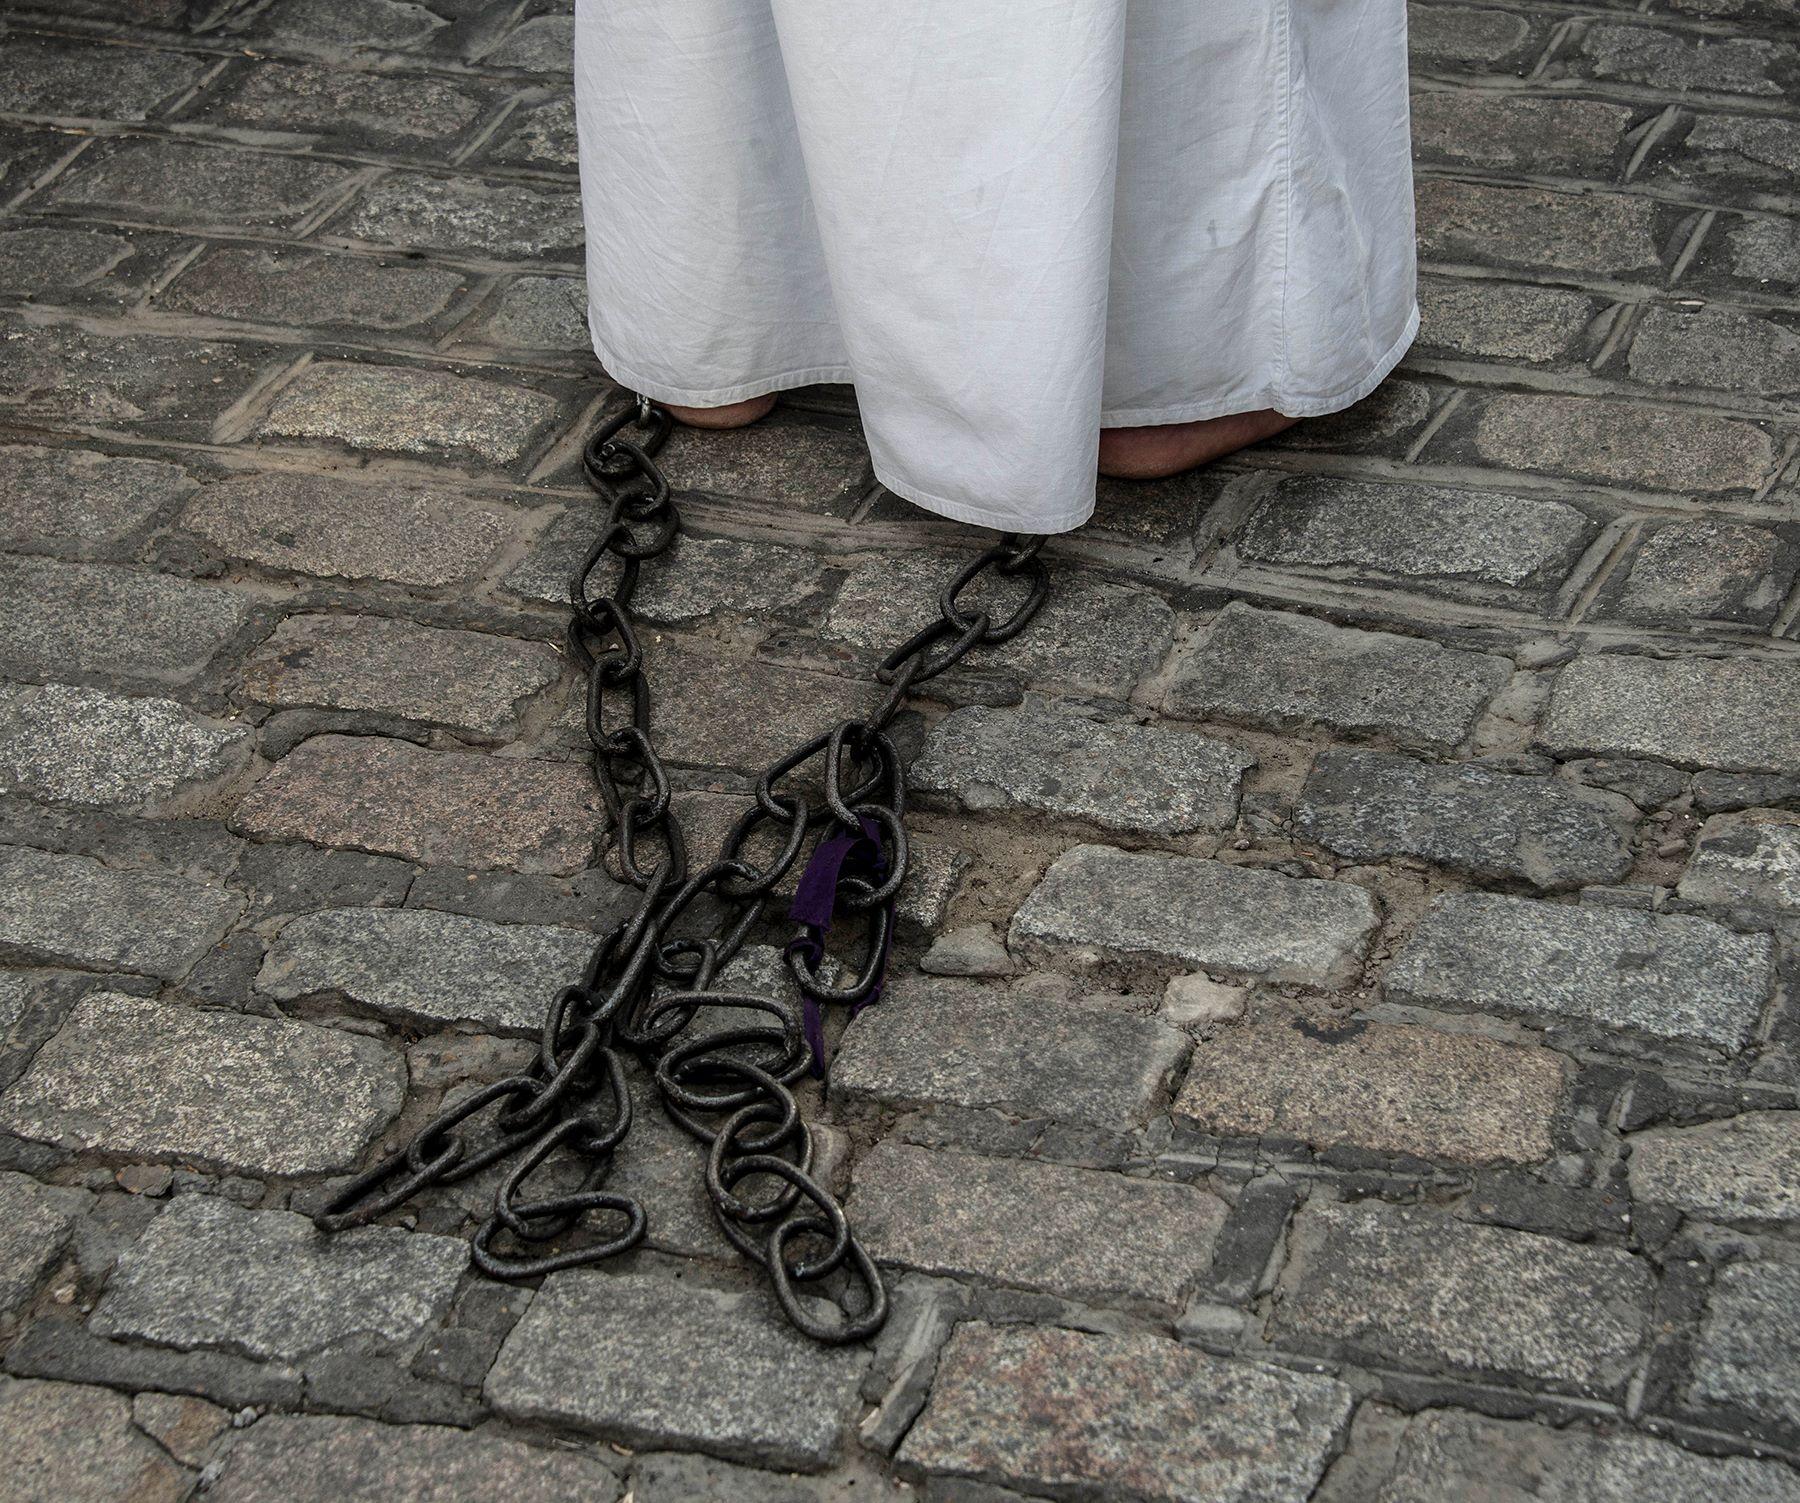 Penitents, not the Klan.